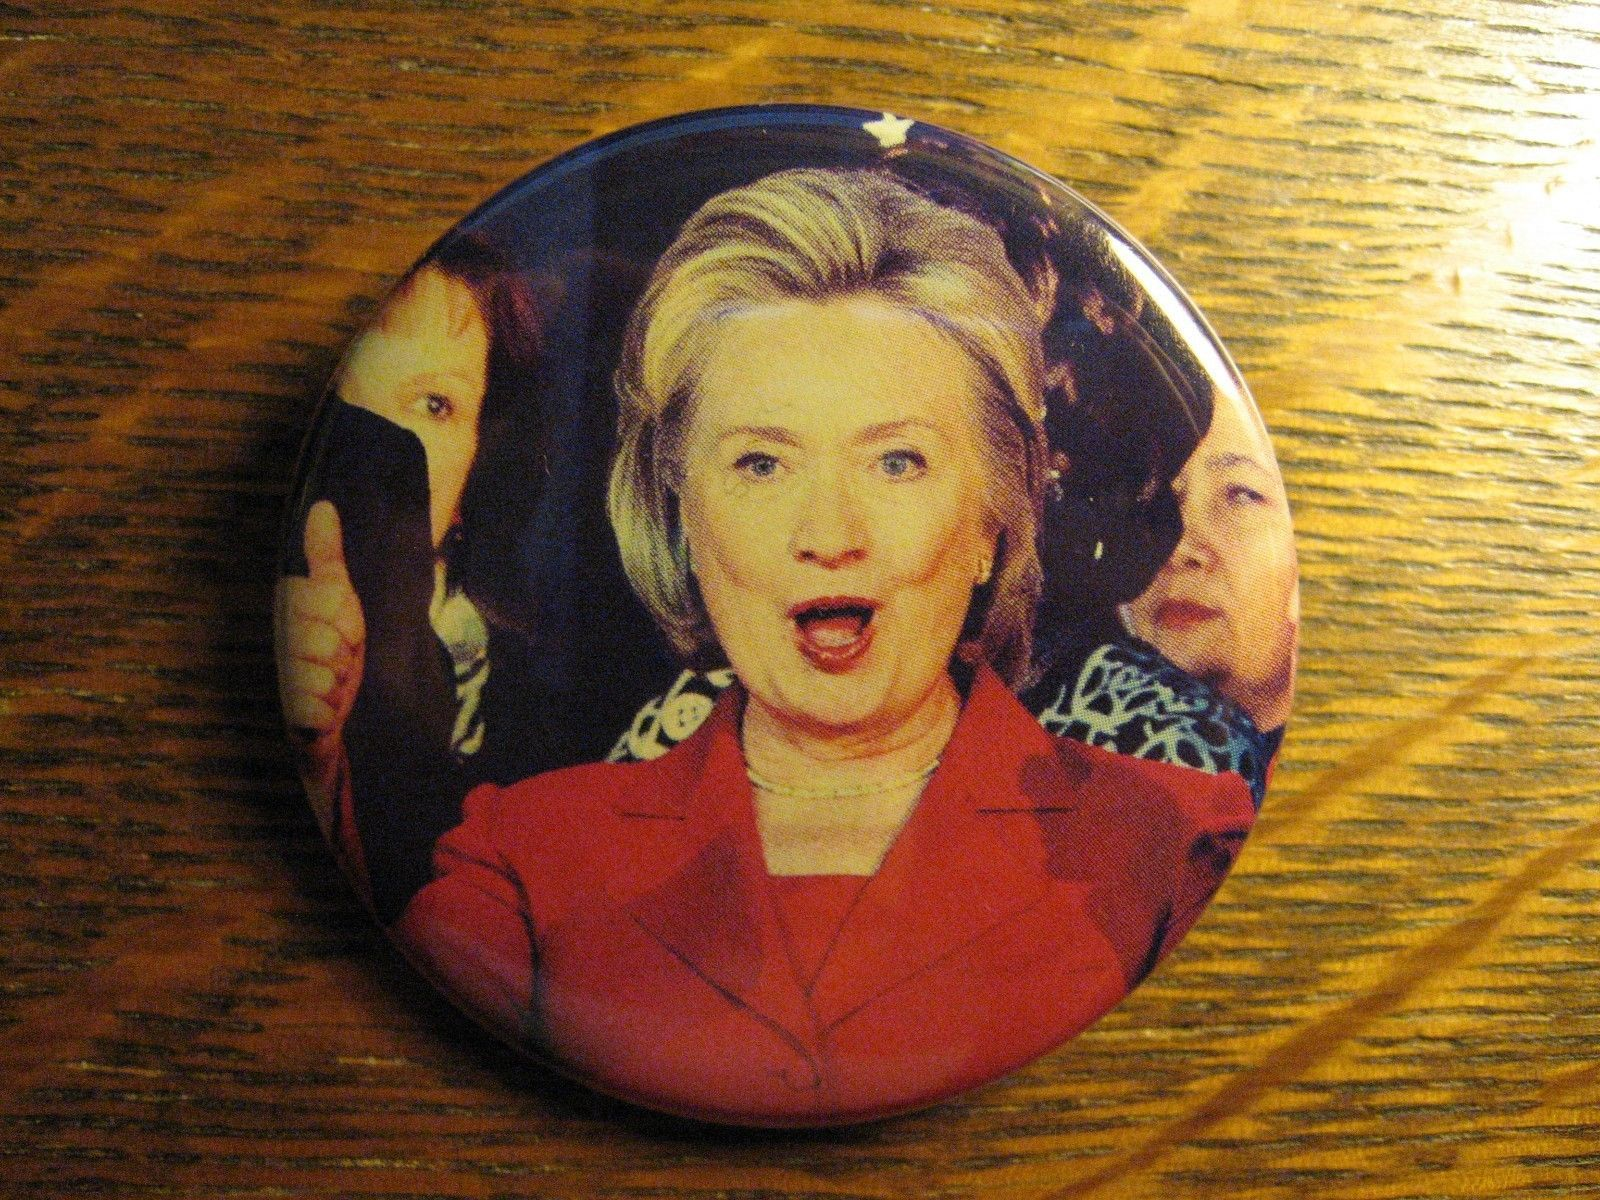 Hillary Clinton USA President Candidate Secretary Of State Lapel Button Pin